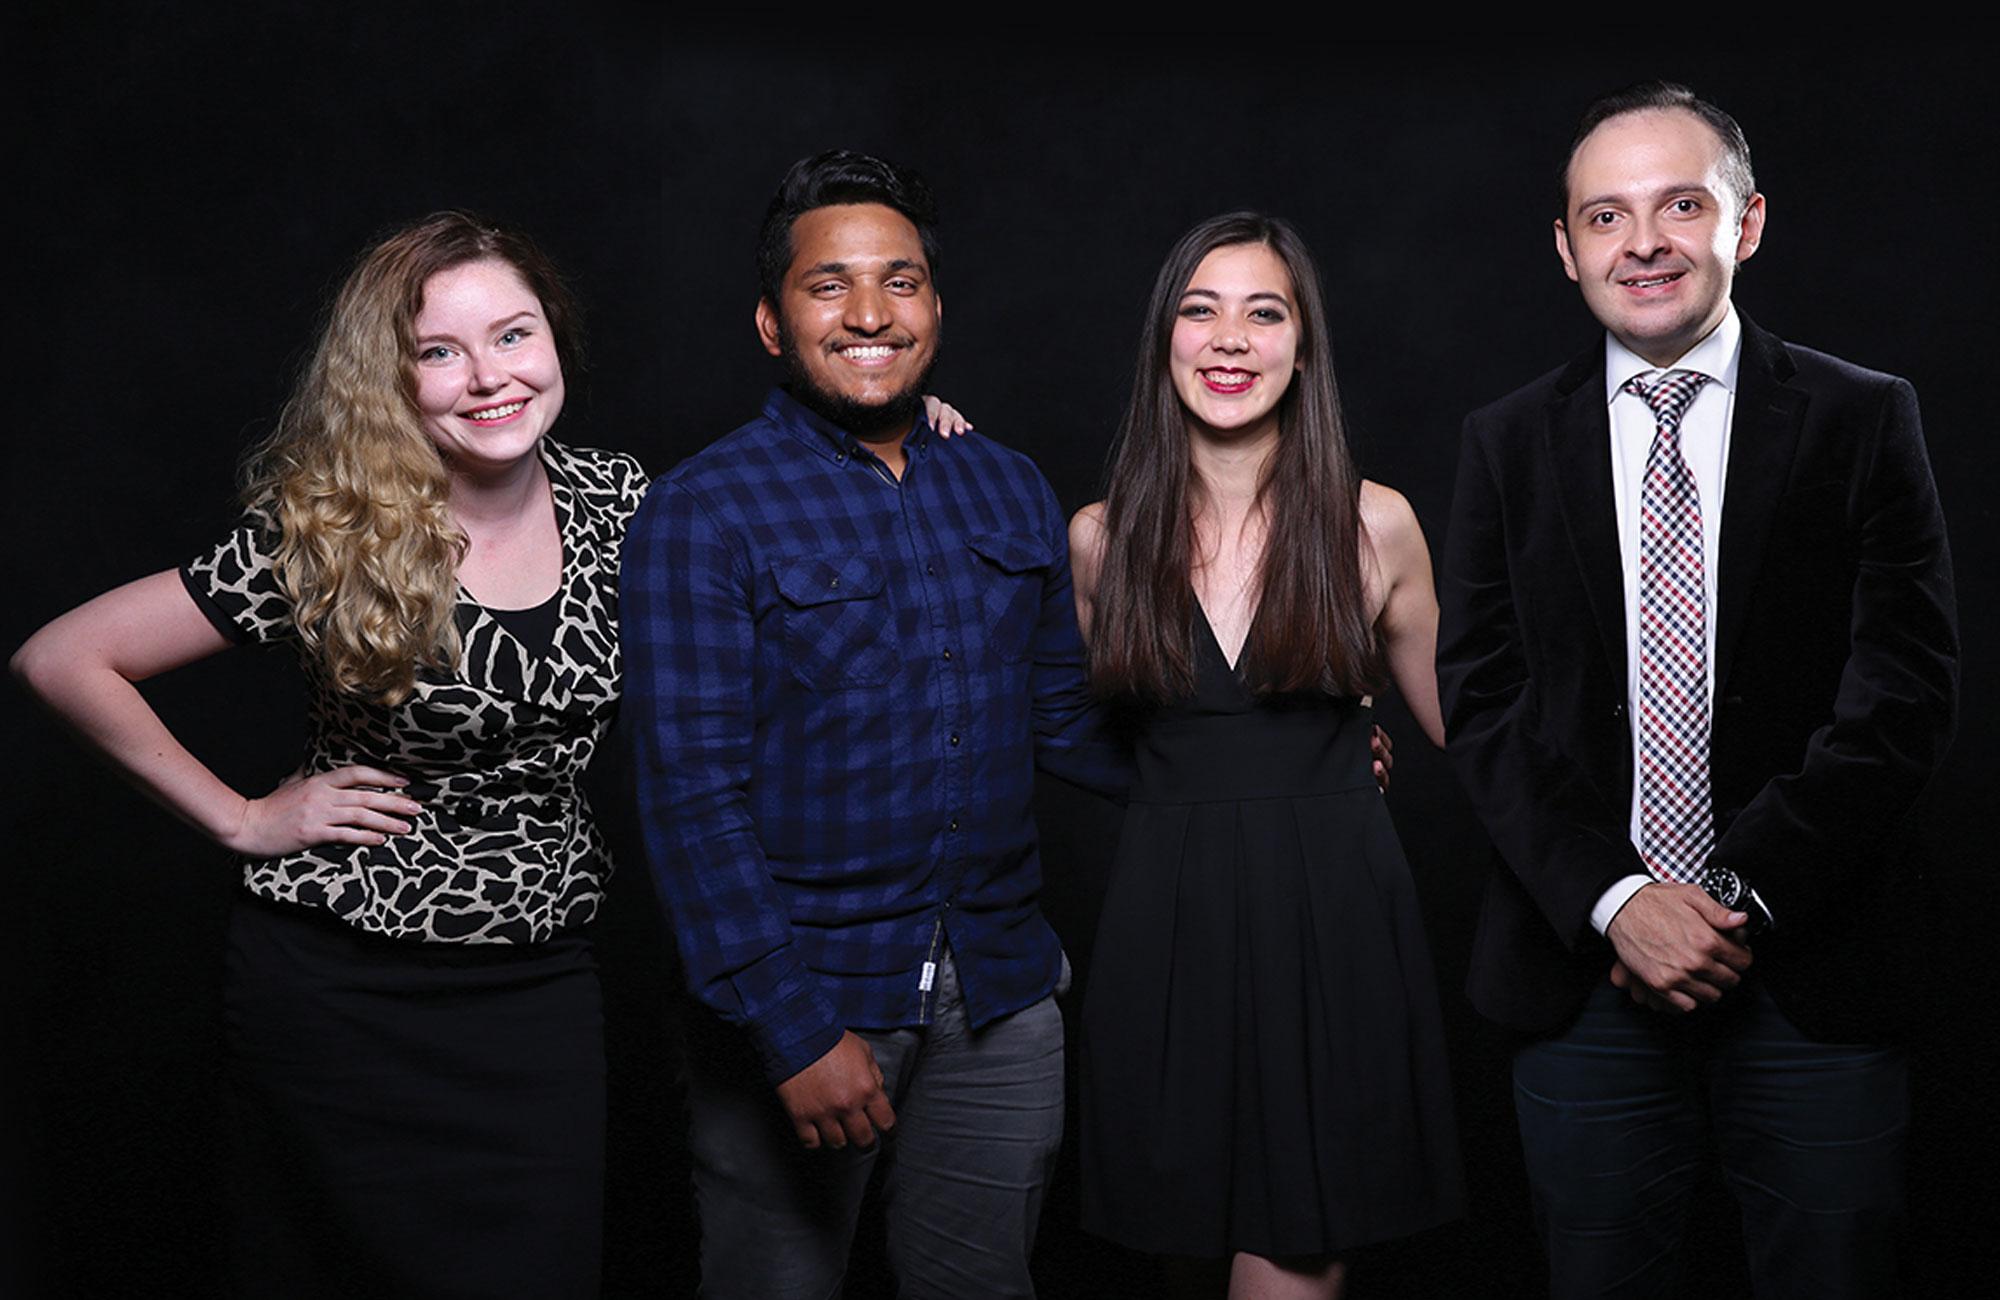 Above: The Fringe team (l to r)—Elena Blaginykh, Paramanand Deginal, Michelle Park, Naser Madi.